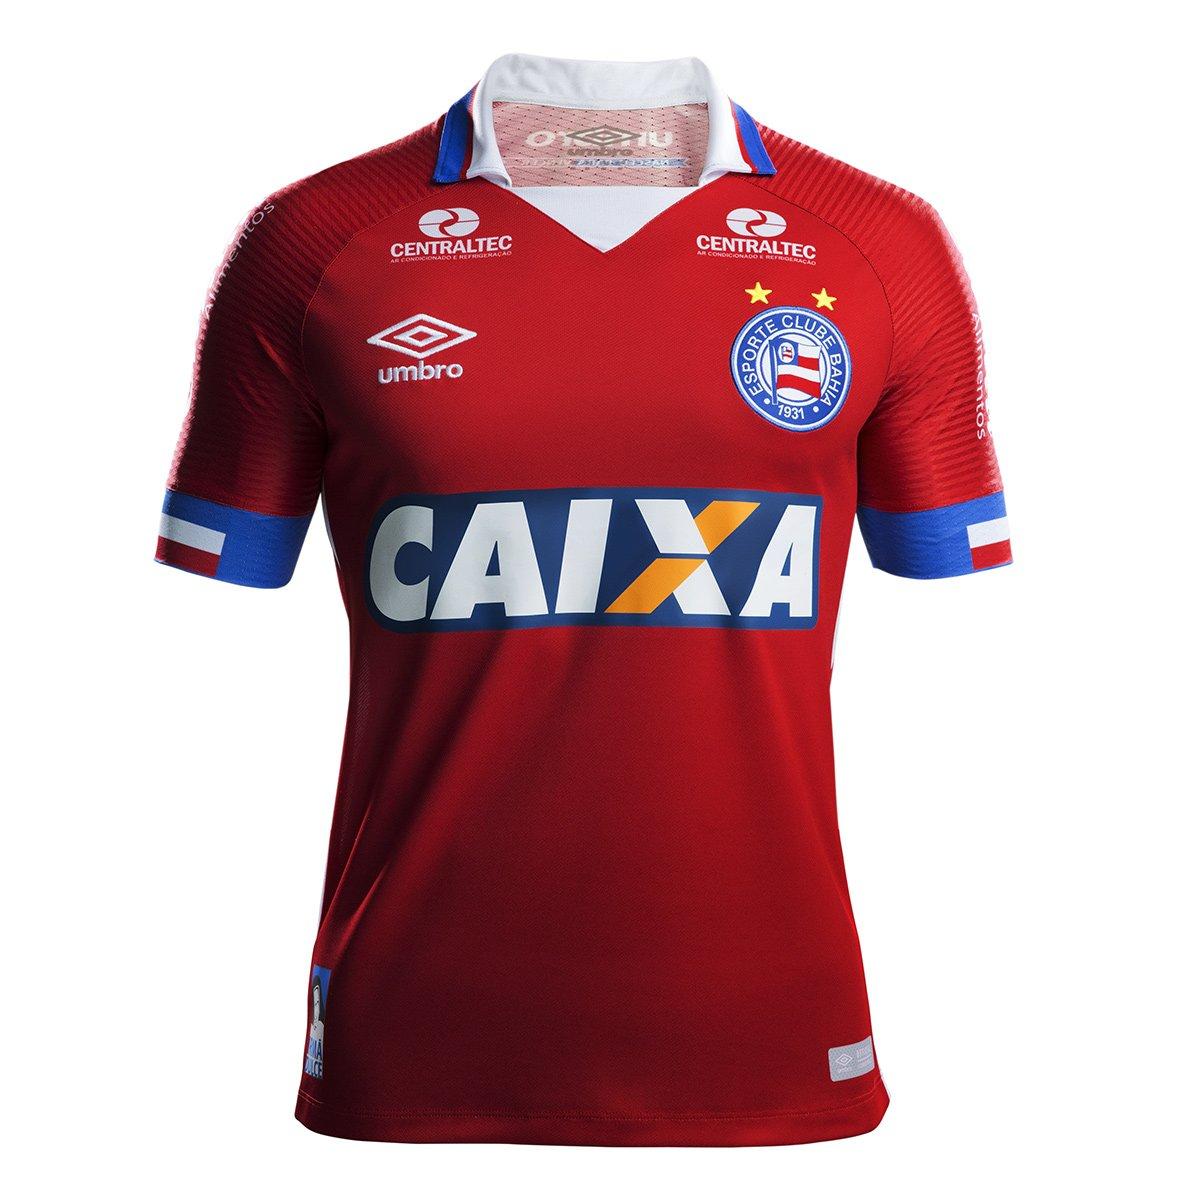 8cc615e9f5 Camisa Bahia III 17 18 s n° - Torcedor Umbro Masculina